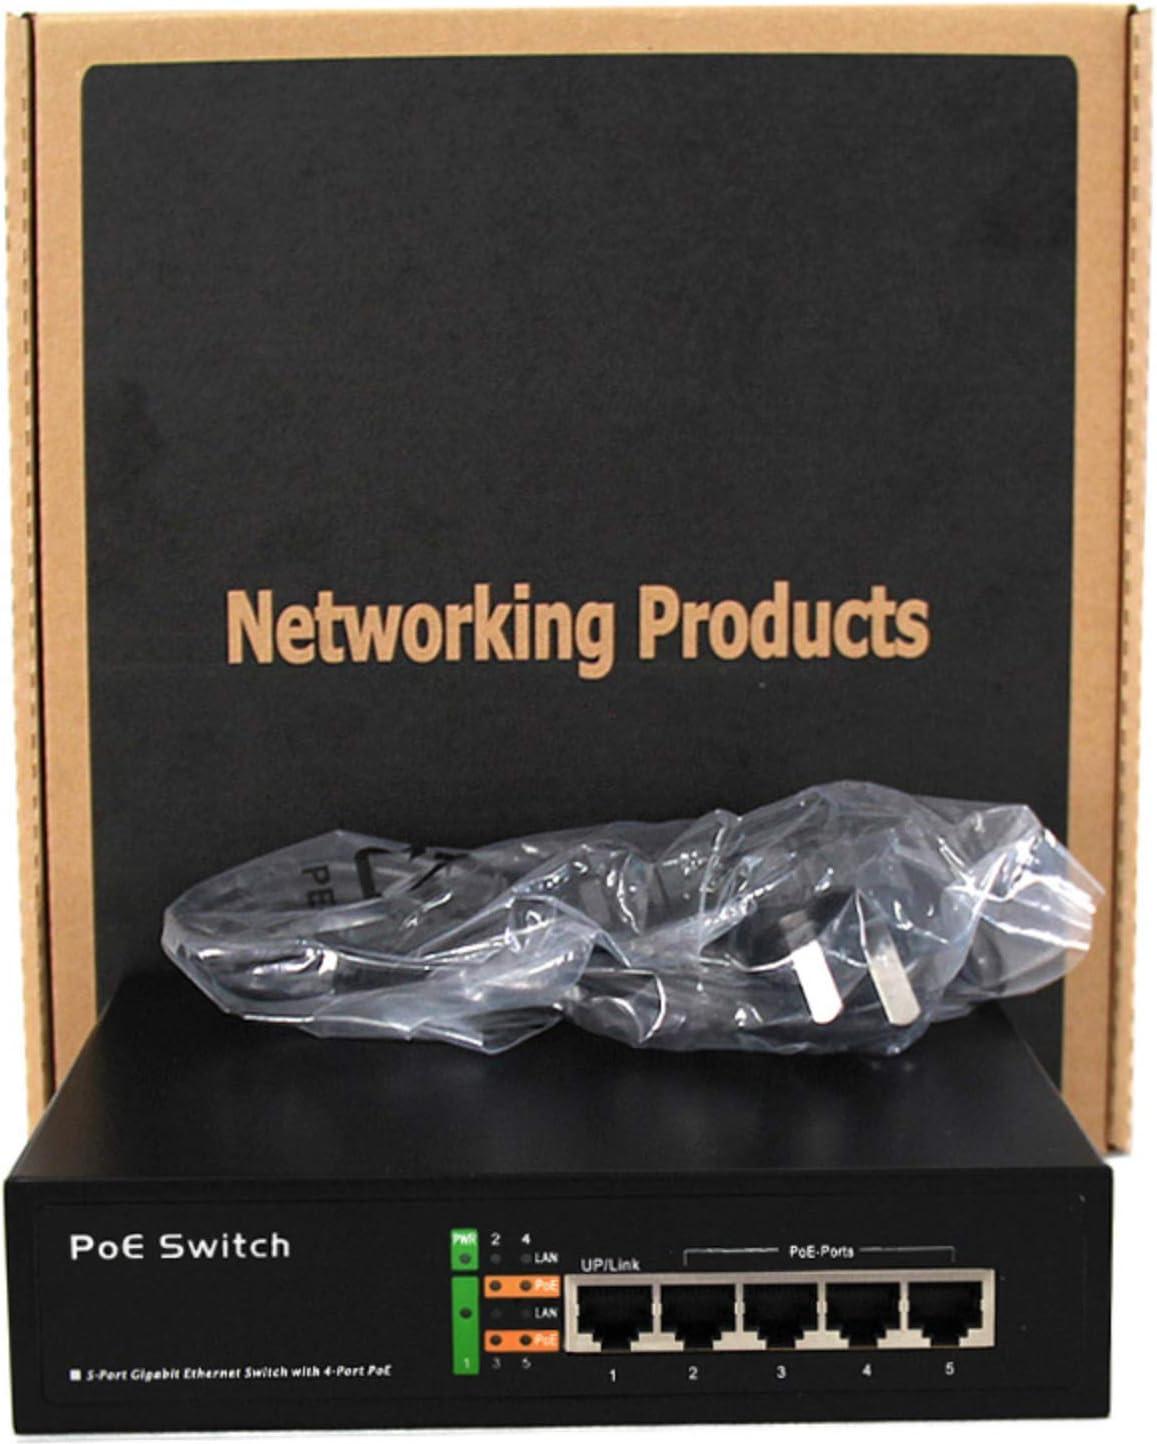 1 Fast UP-Link Desktop 10//100 Mbps 86W TroheStar 9 Port POE Switch 8 Port POE